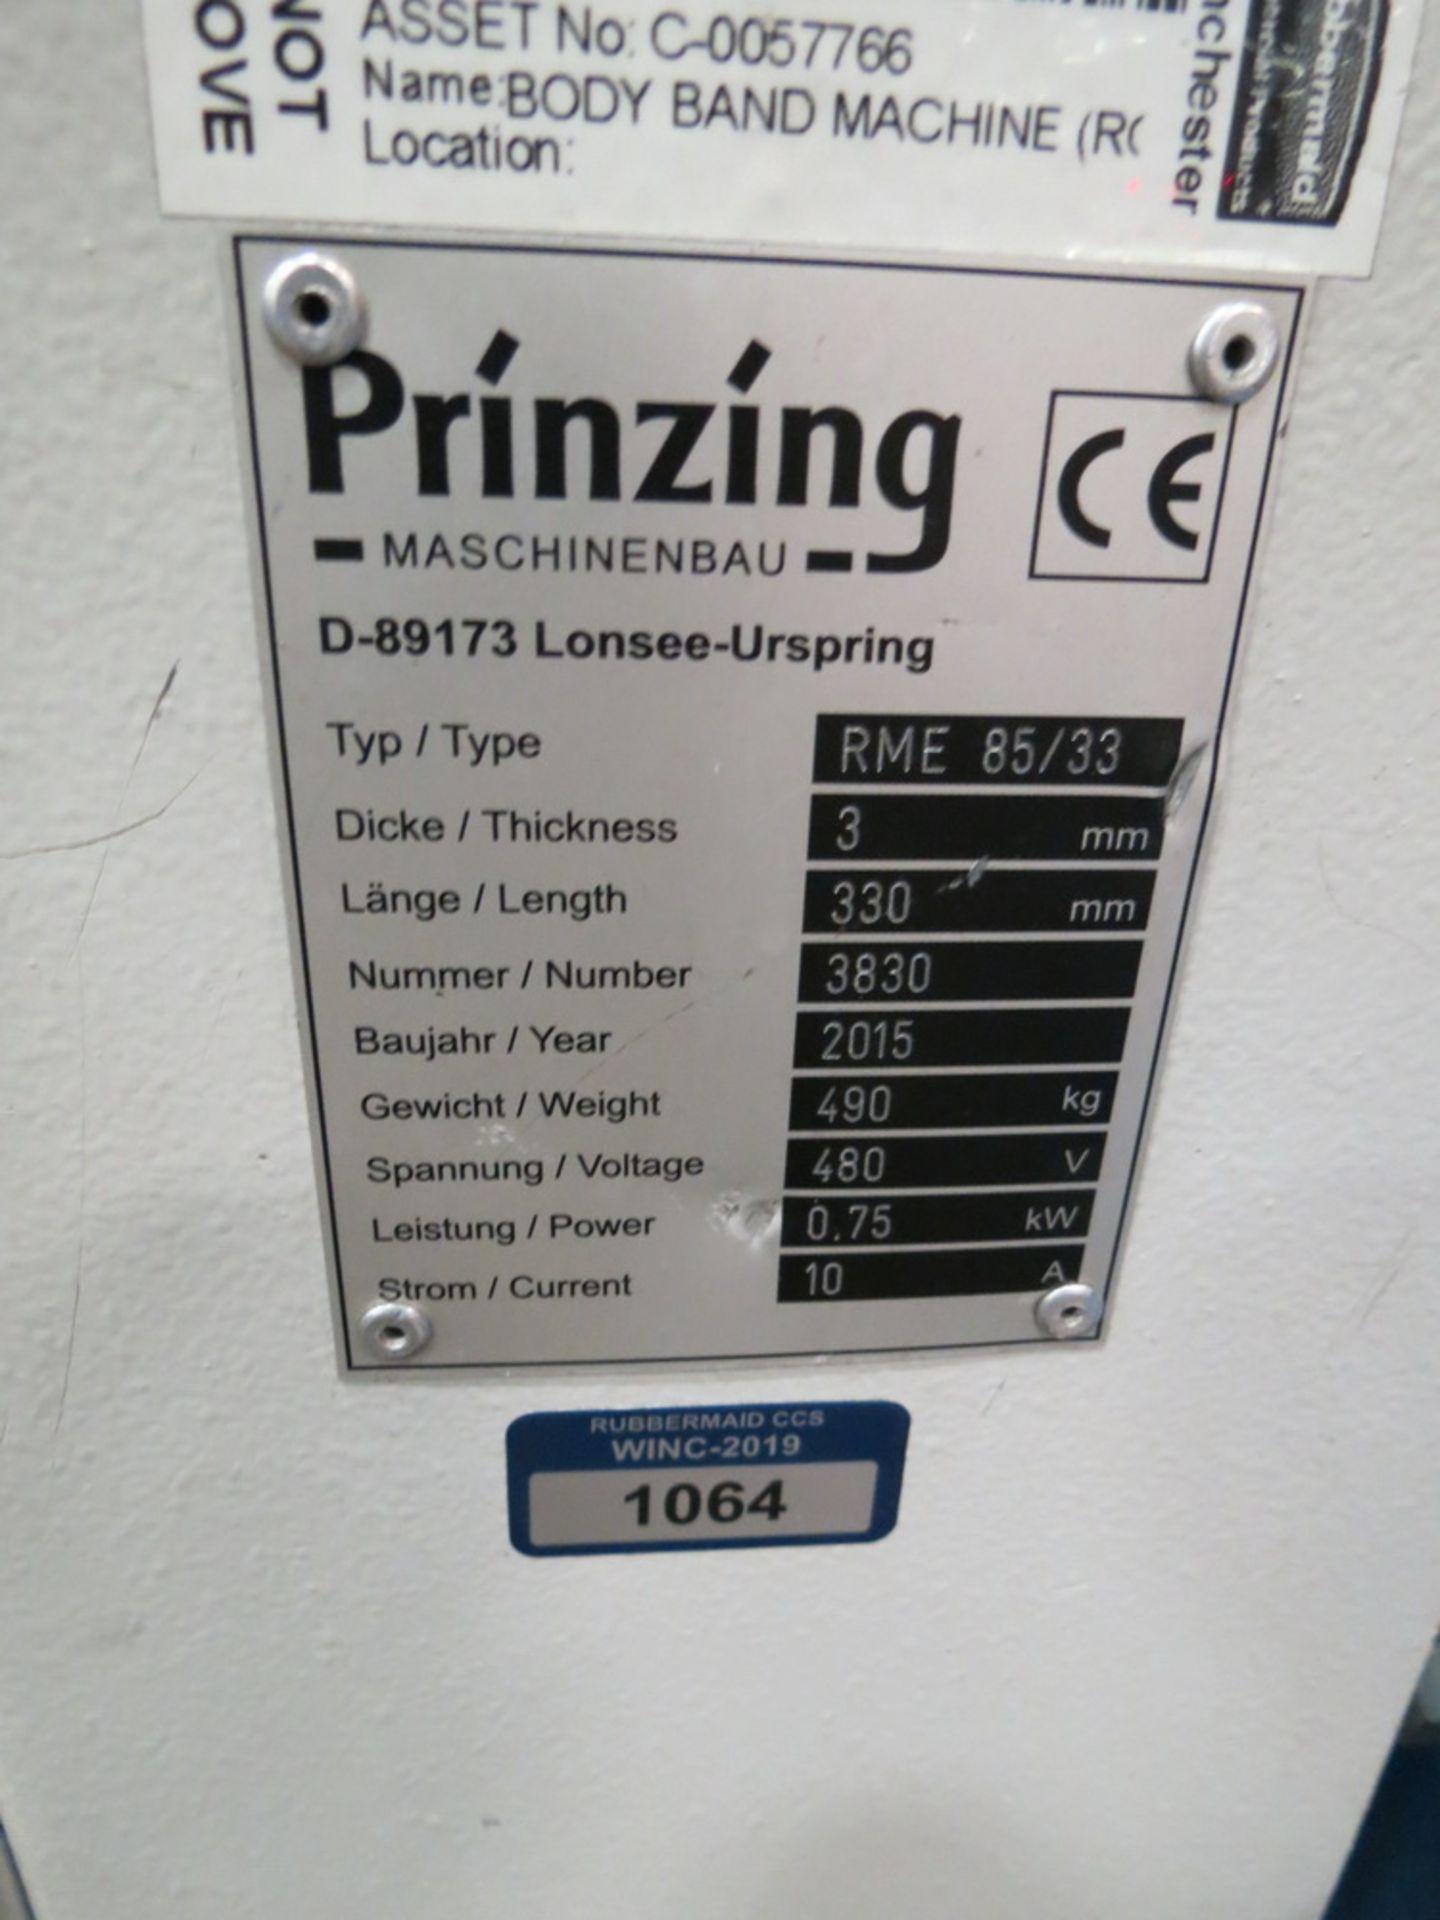 "Lot 54 - 2015 Prinzing Model RME85/33 Approx. 11.5"" Round 4-Roll Bender w/ Eaton Digital Controls"